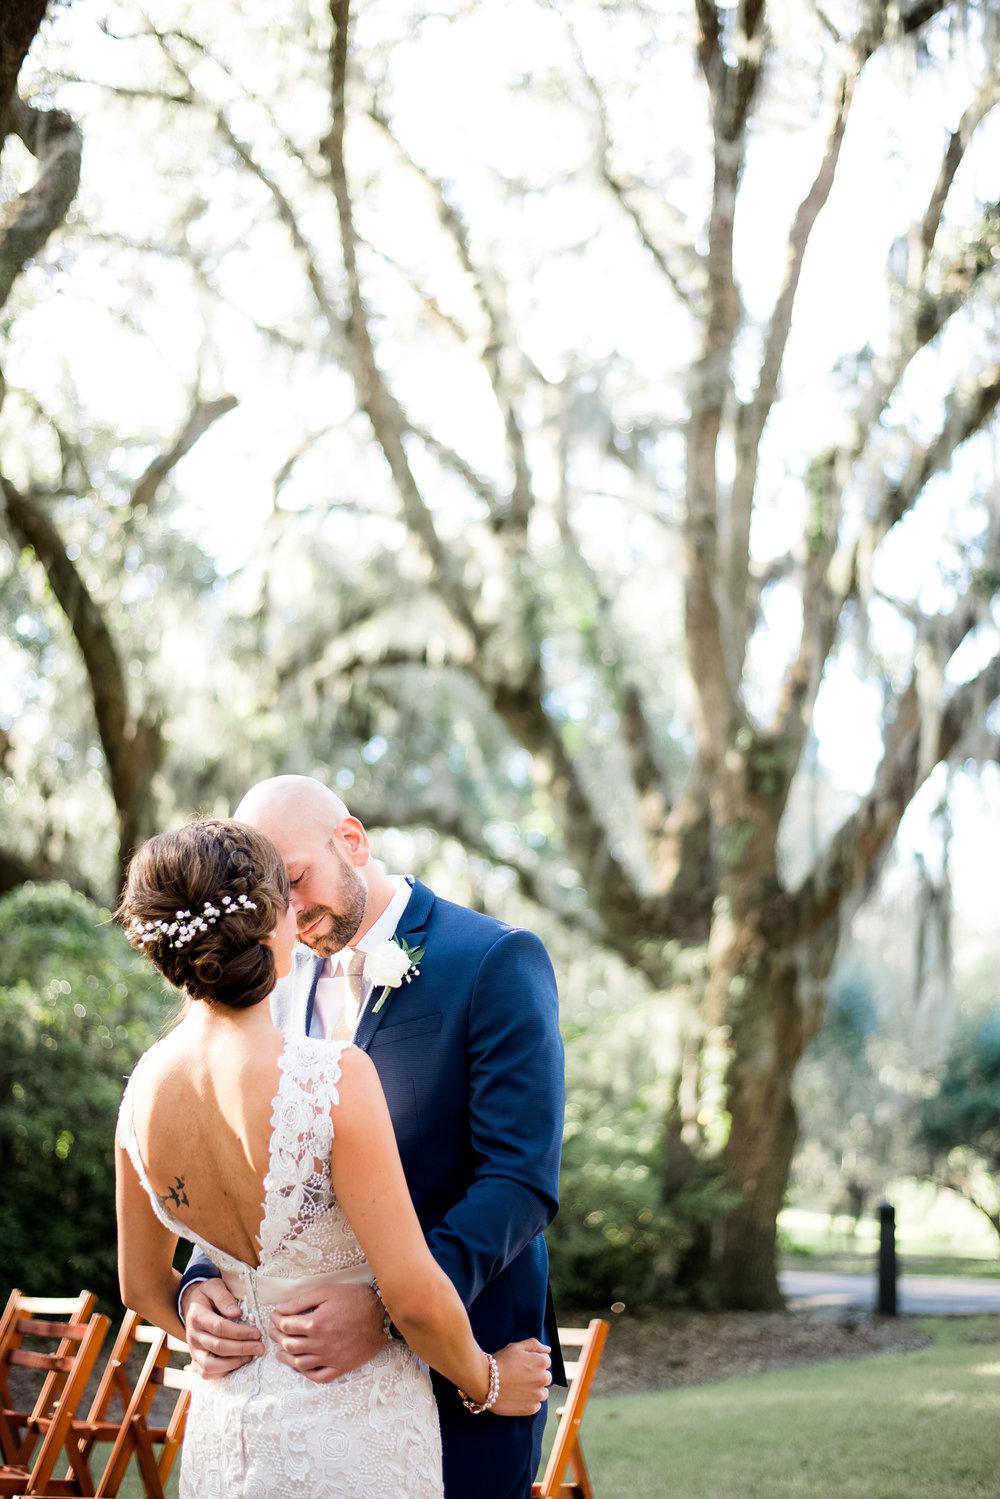 LAUREN + DAVID | CHARLESTON WEDDINGS-29.JPG